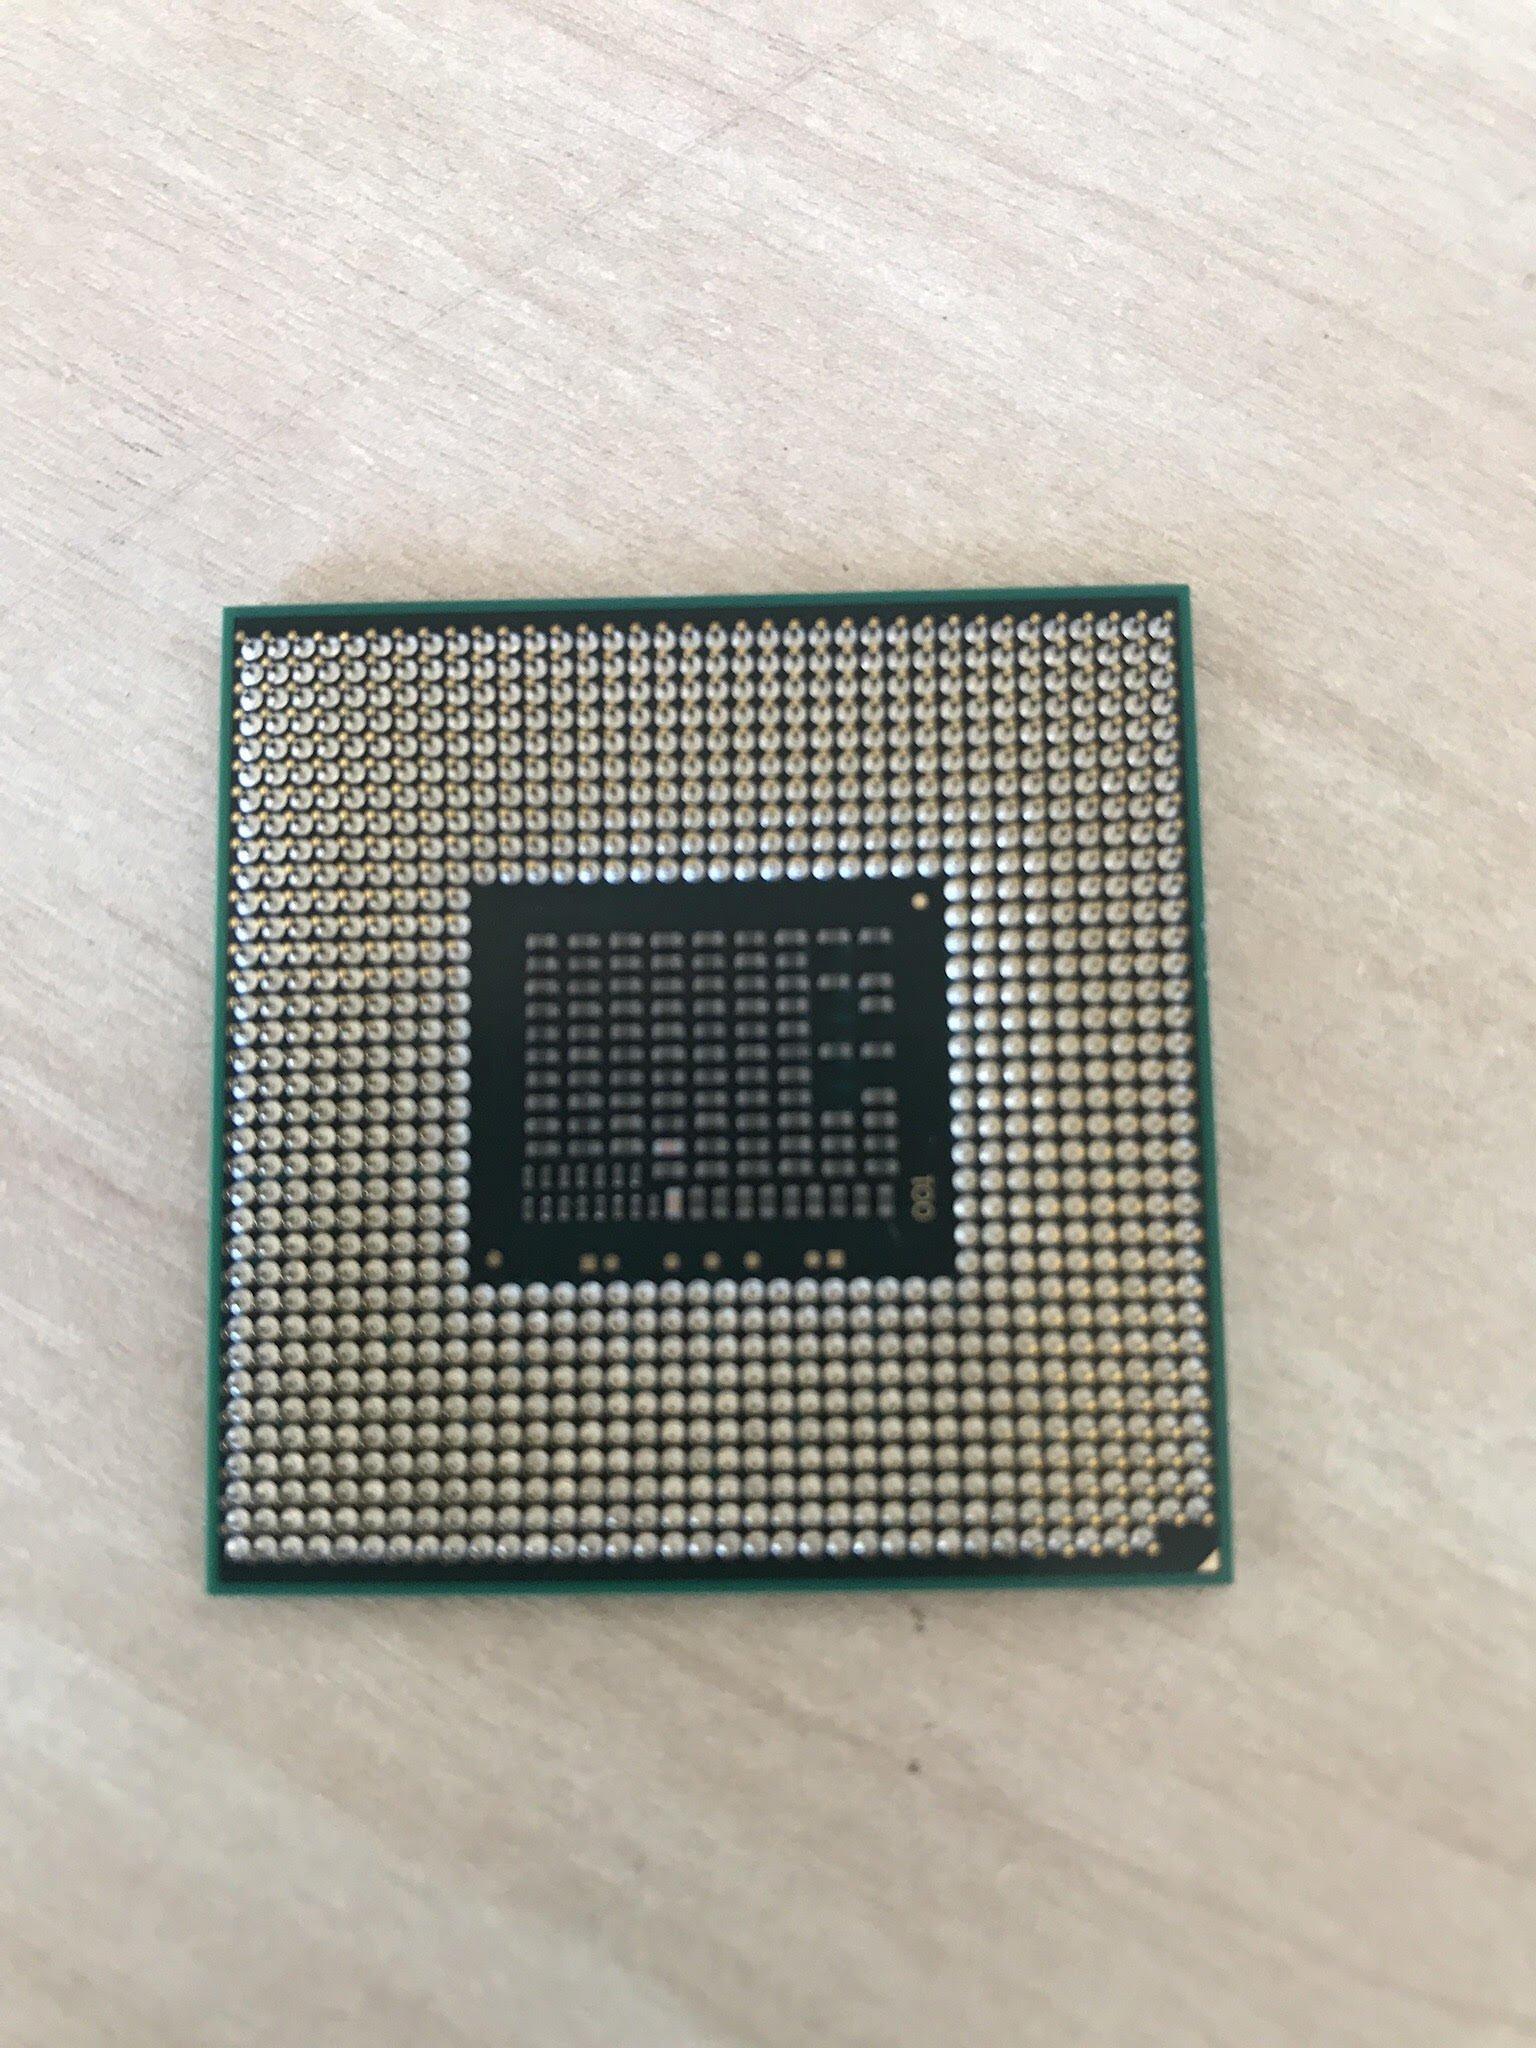 Intel Core i3-2310M SR04R 2.1GHz 3MB Dual-core Mobile CPU Processor Socket G2 988-pin by Intel (Image #1)